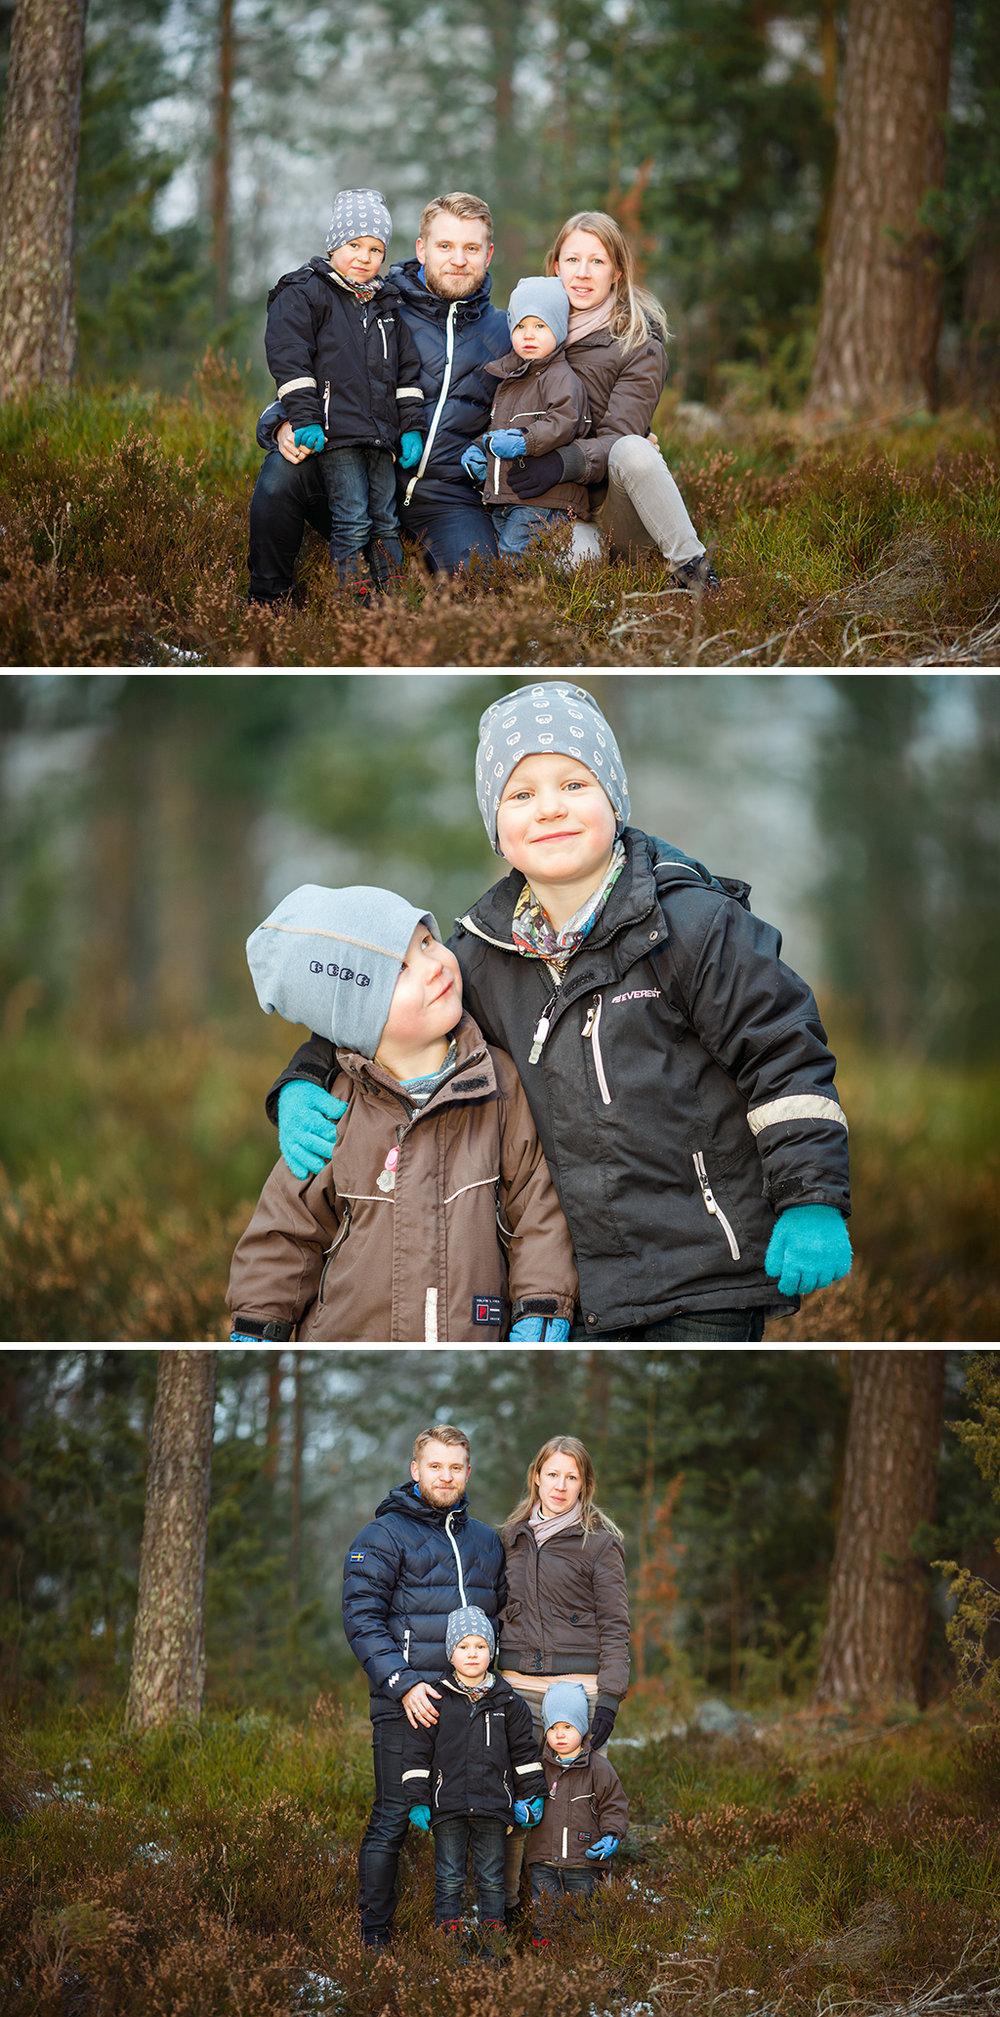 Vinter-familjefotografering-familjefotograf-Stockholm_1.jpg